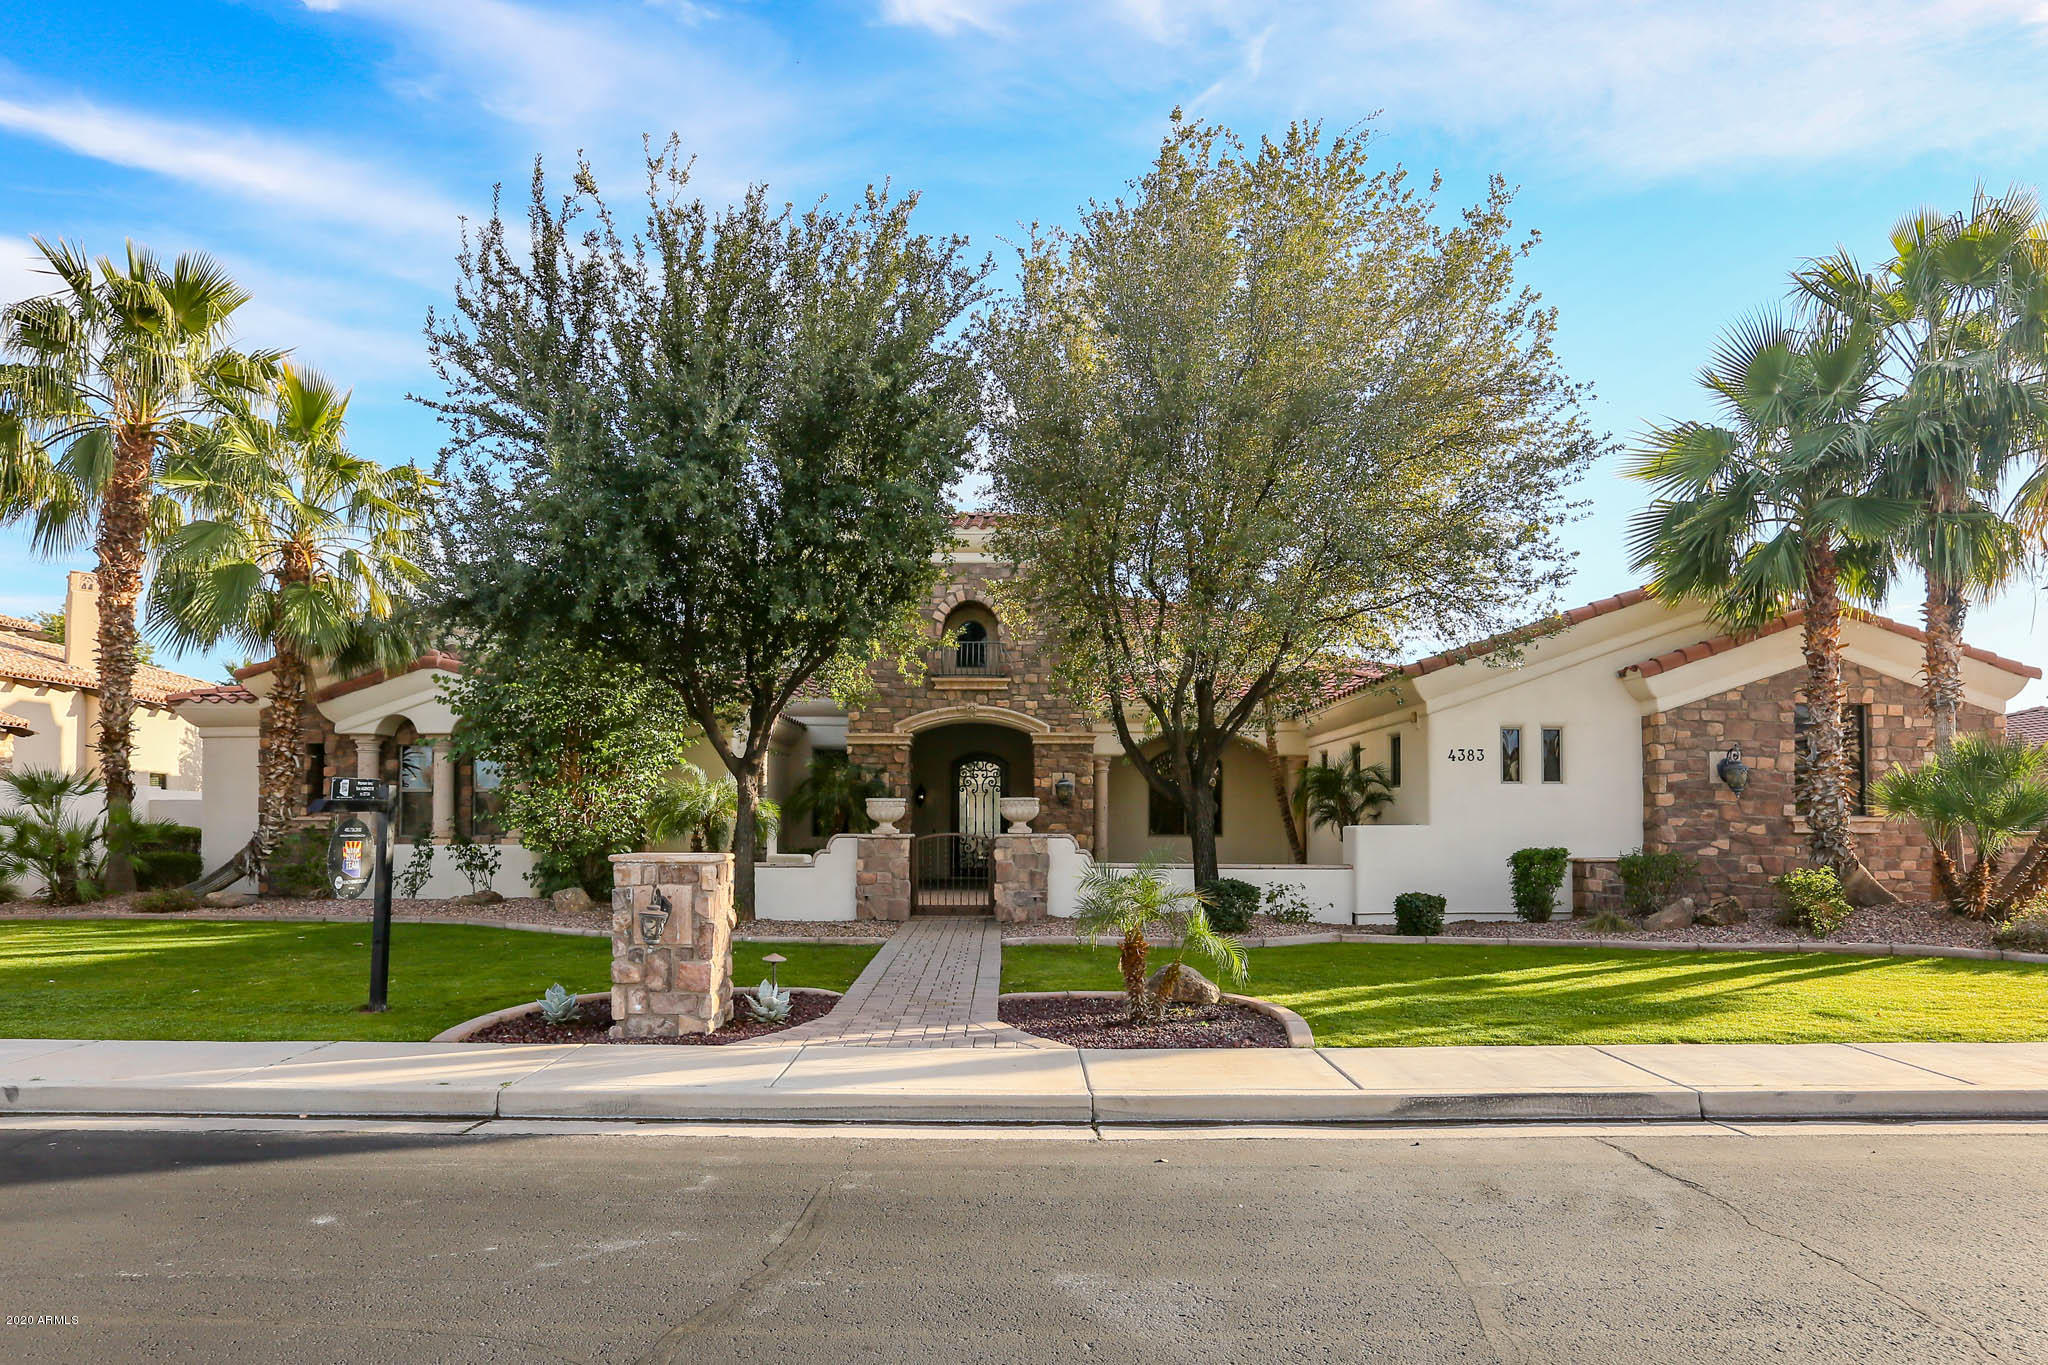 Photo of 4383 E LIBRA Place, Chandler, AZ 85249